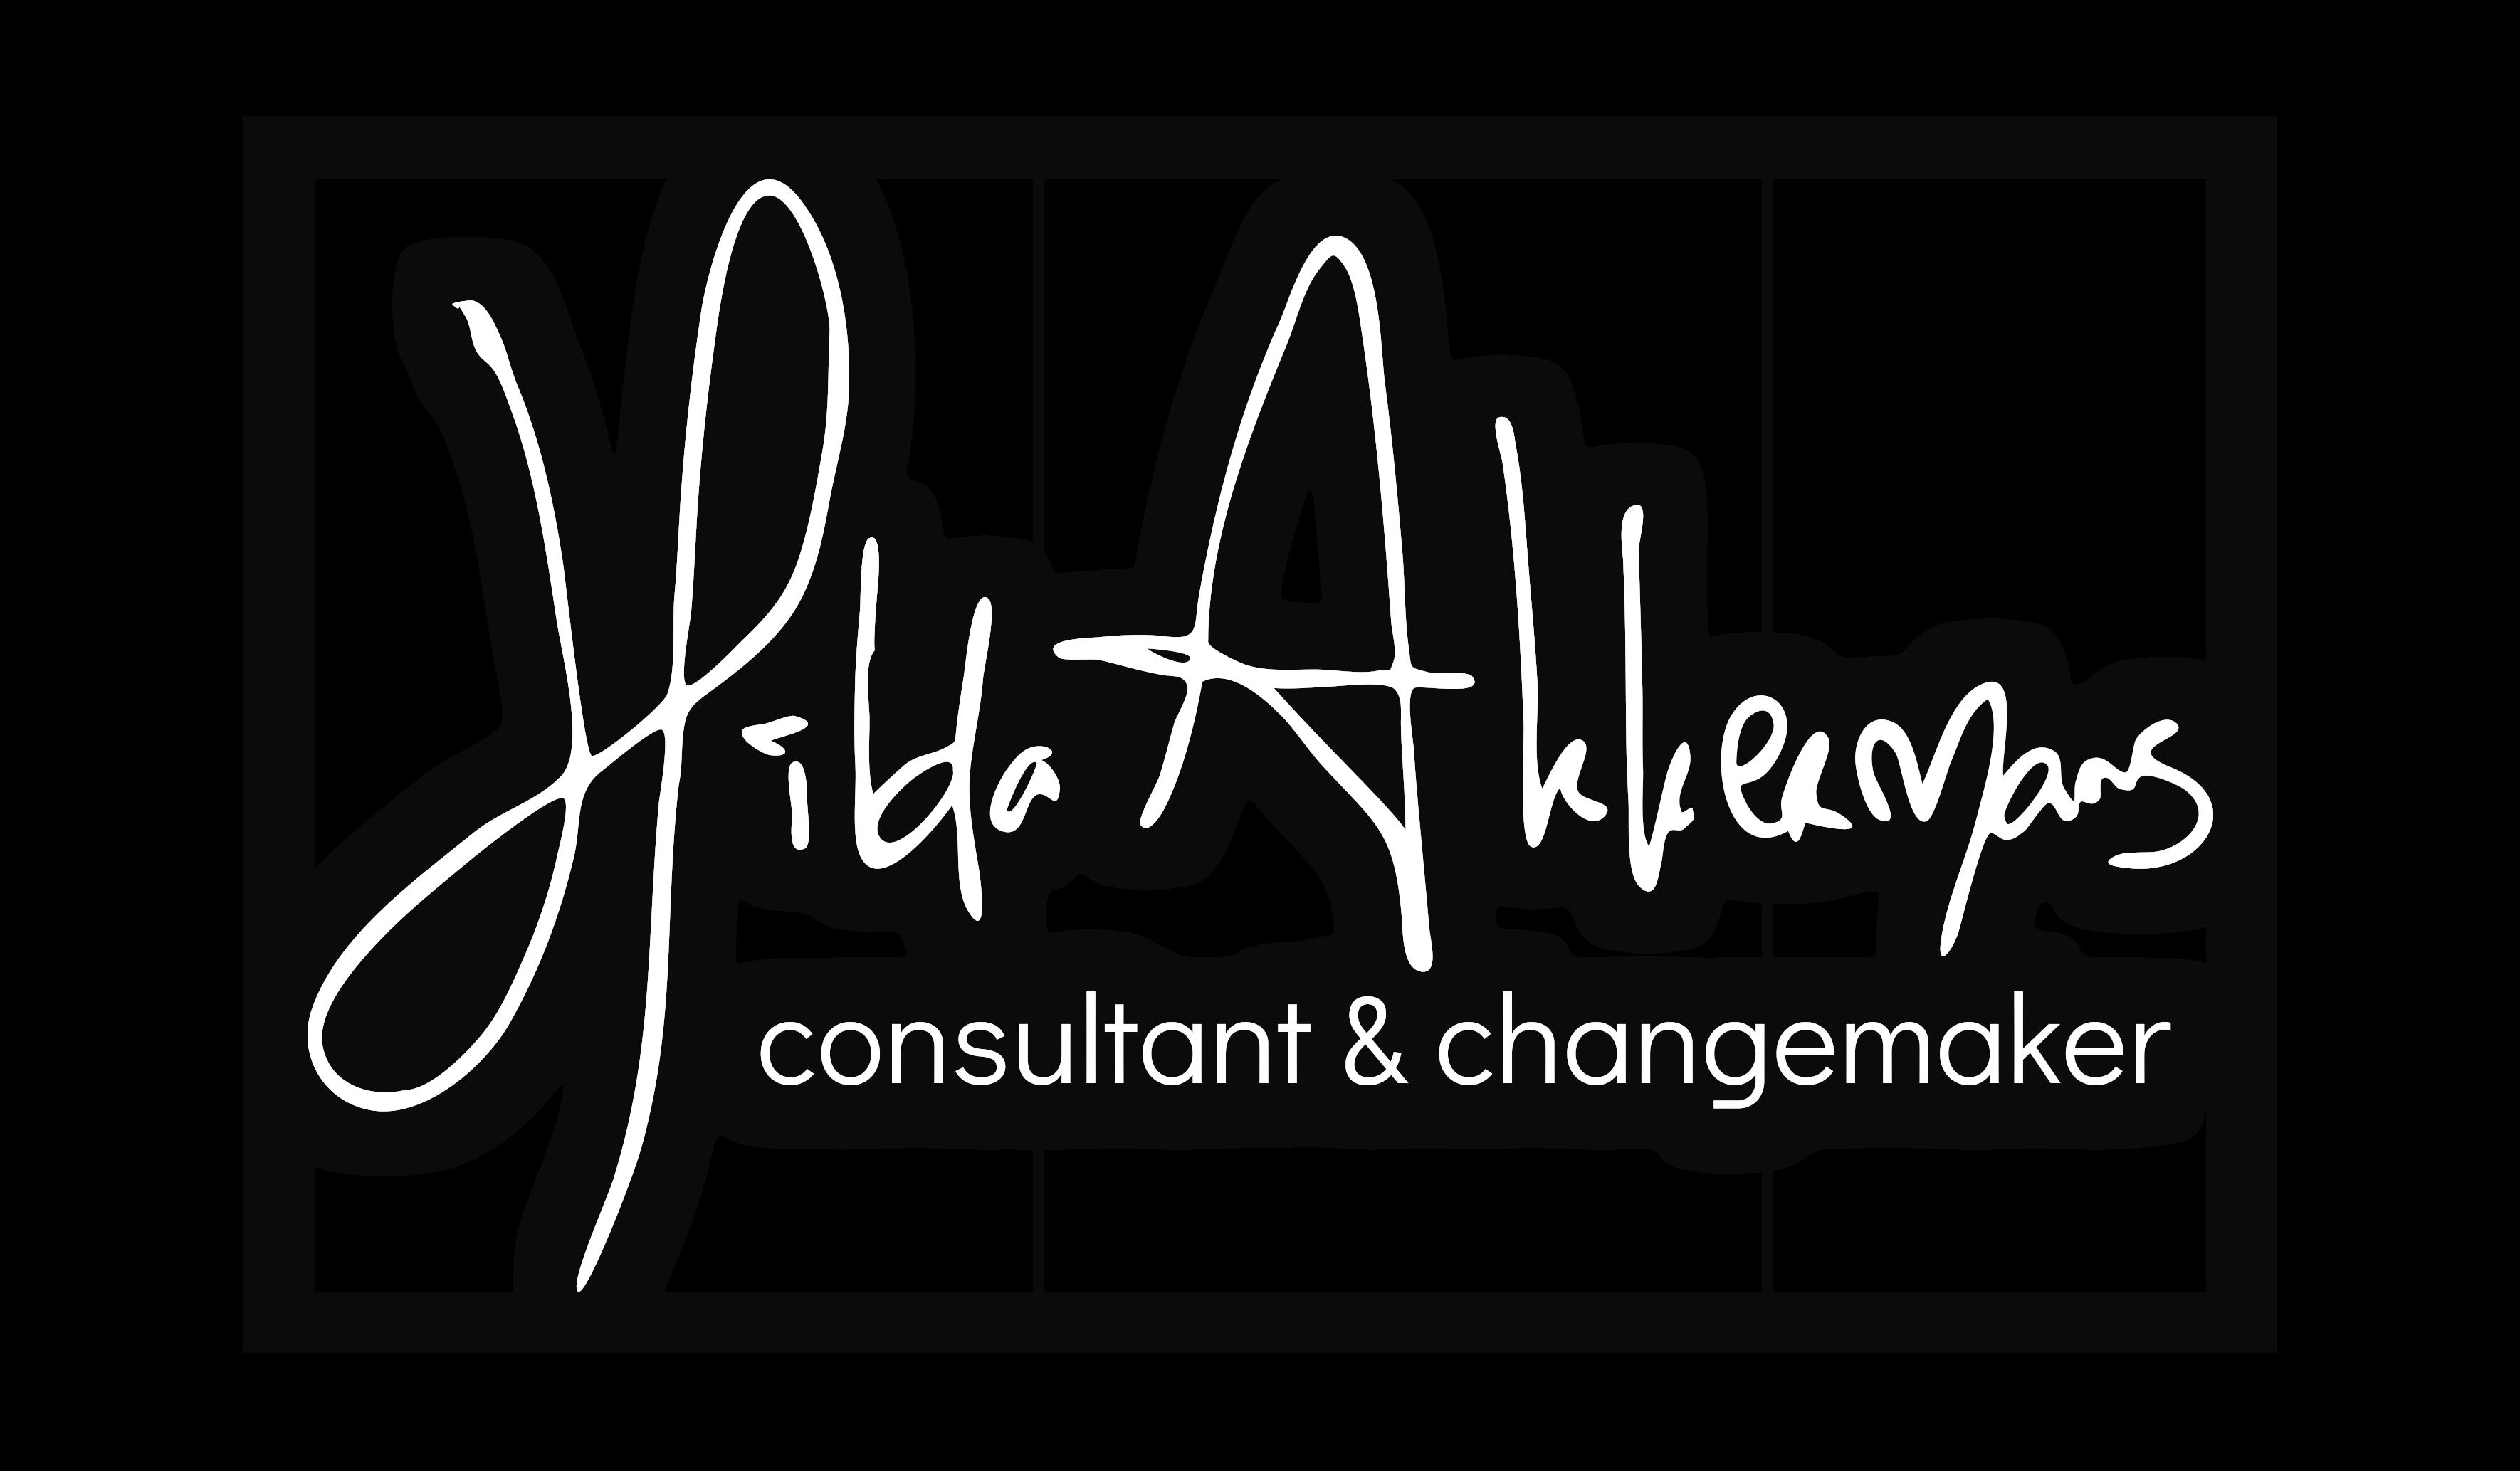 Hilda Akkermans Consultant & Changemaker Logo